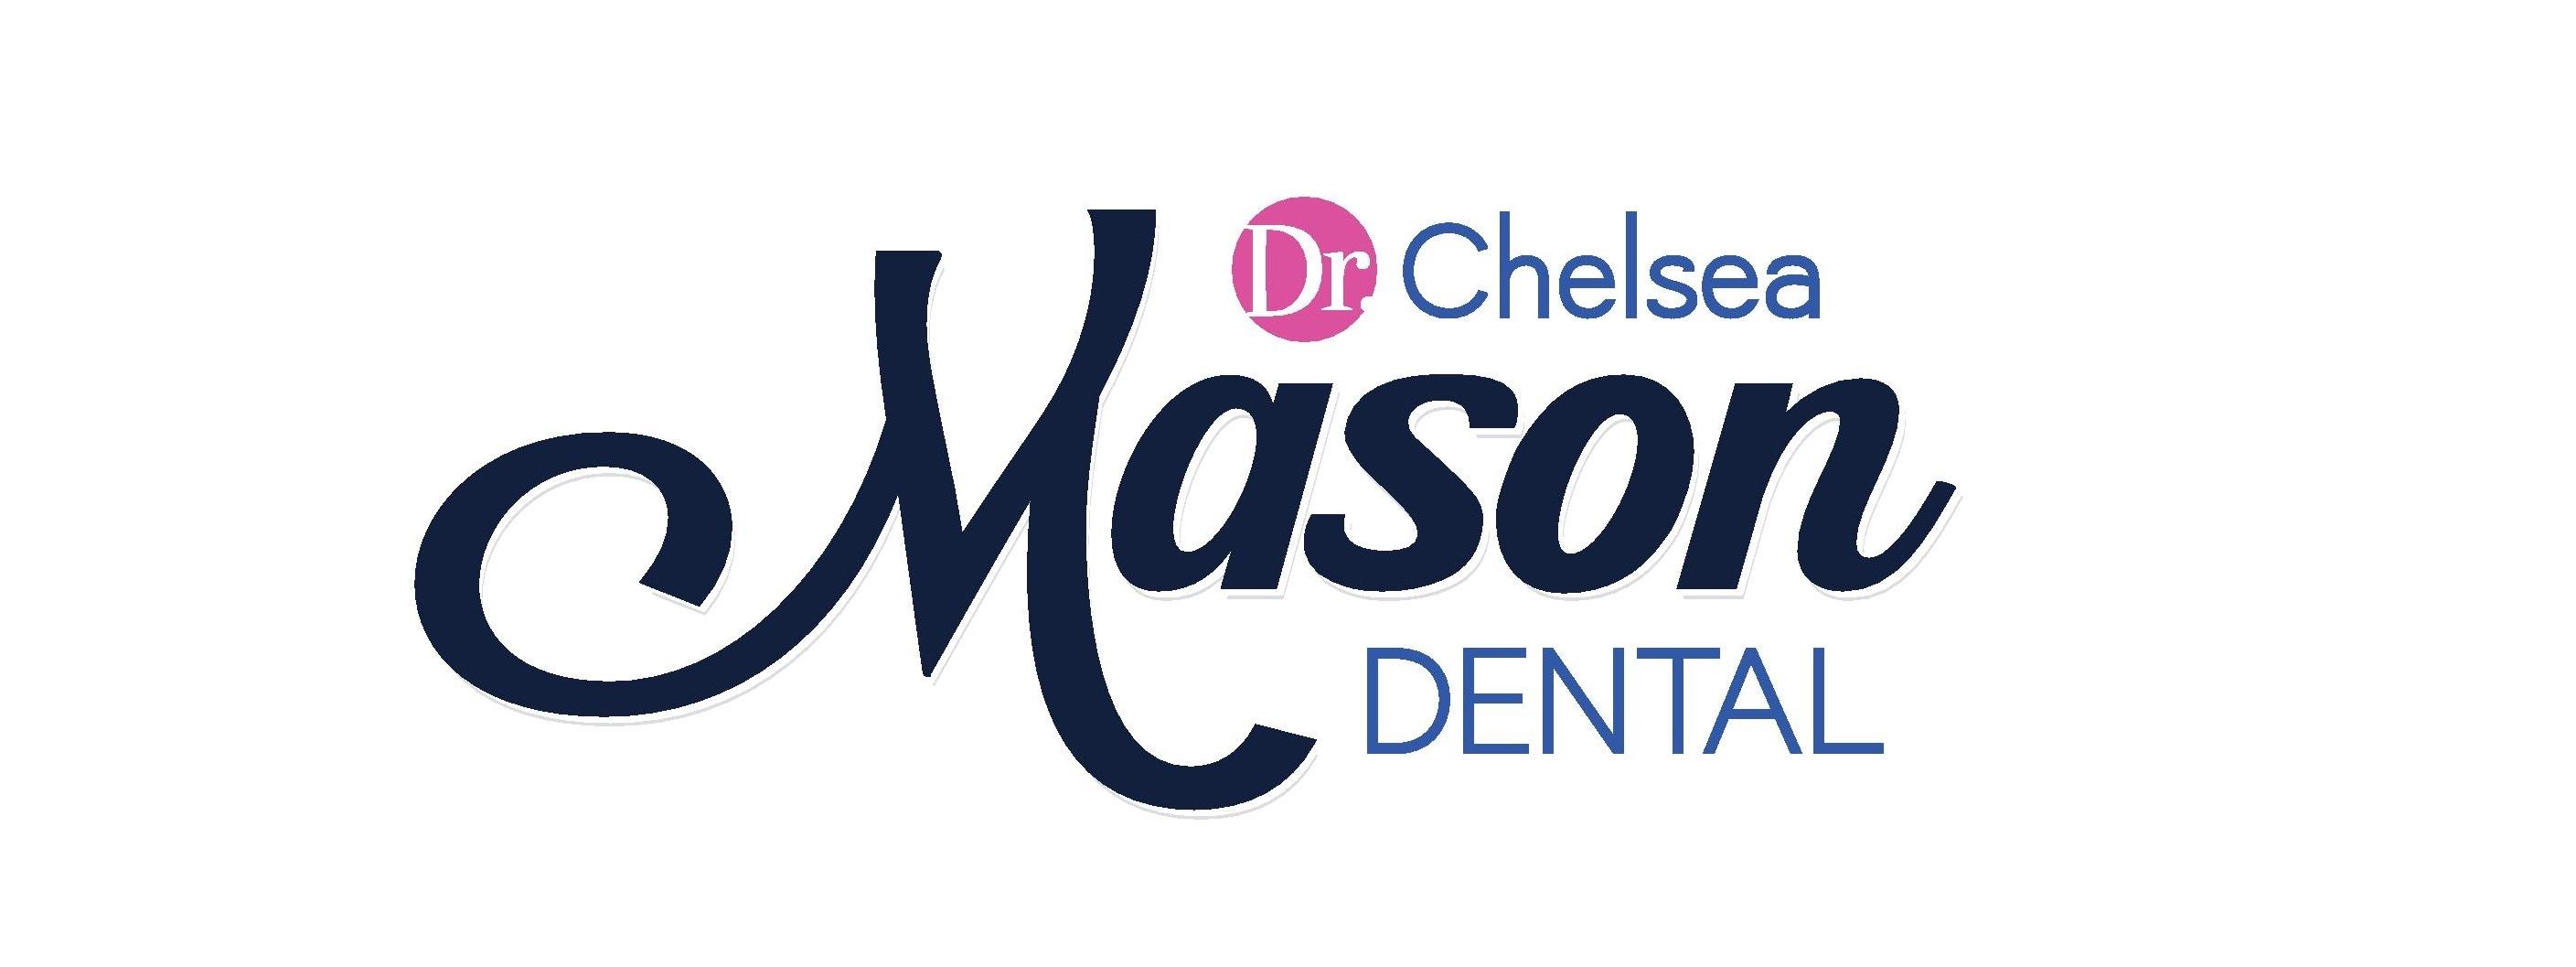 Dr. Chelsea Mason Dental image 0